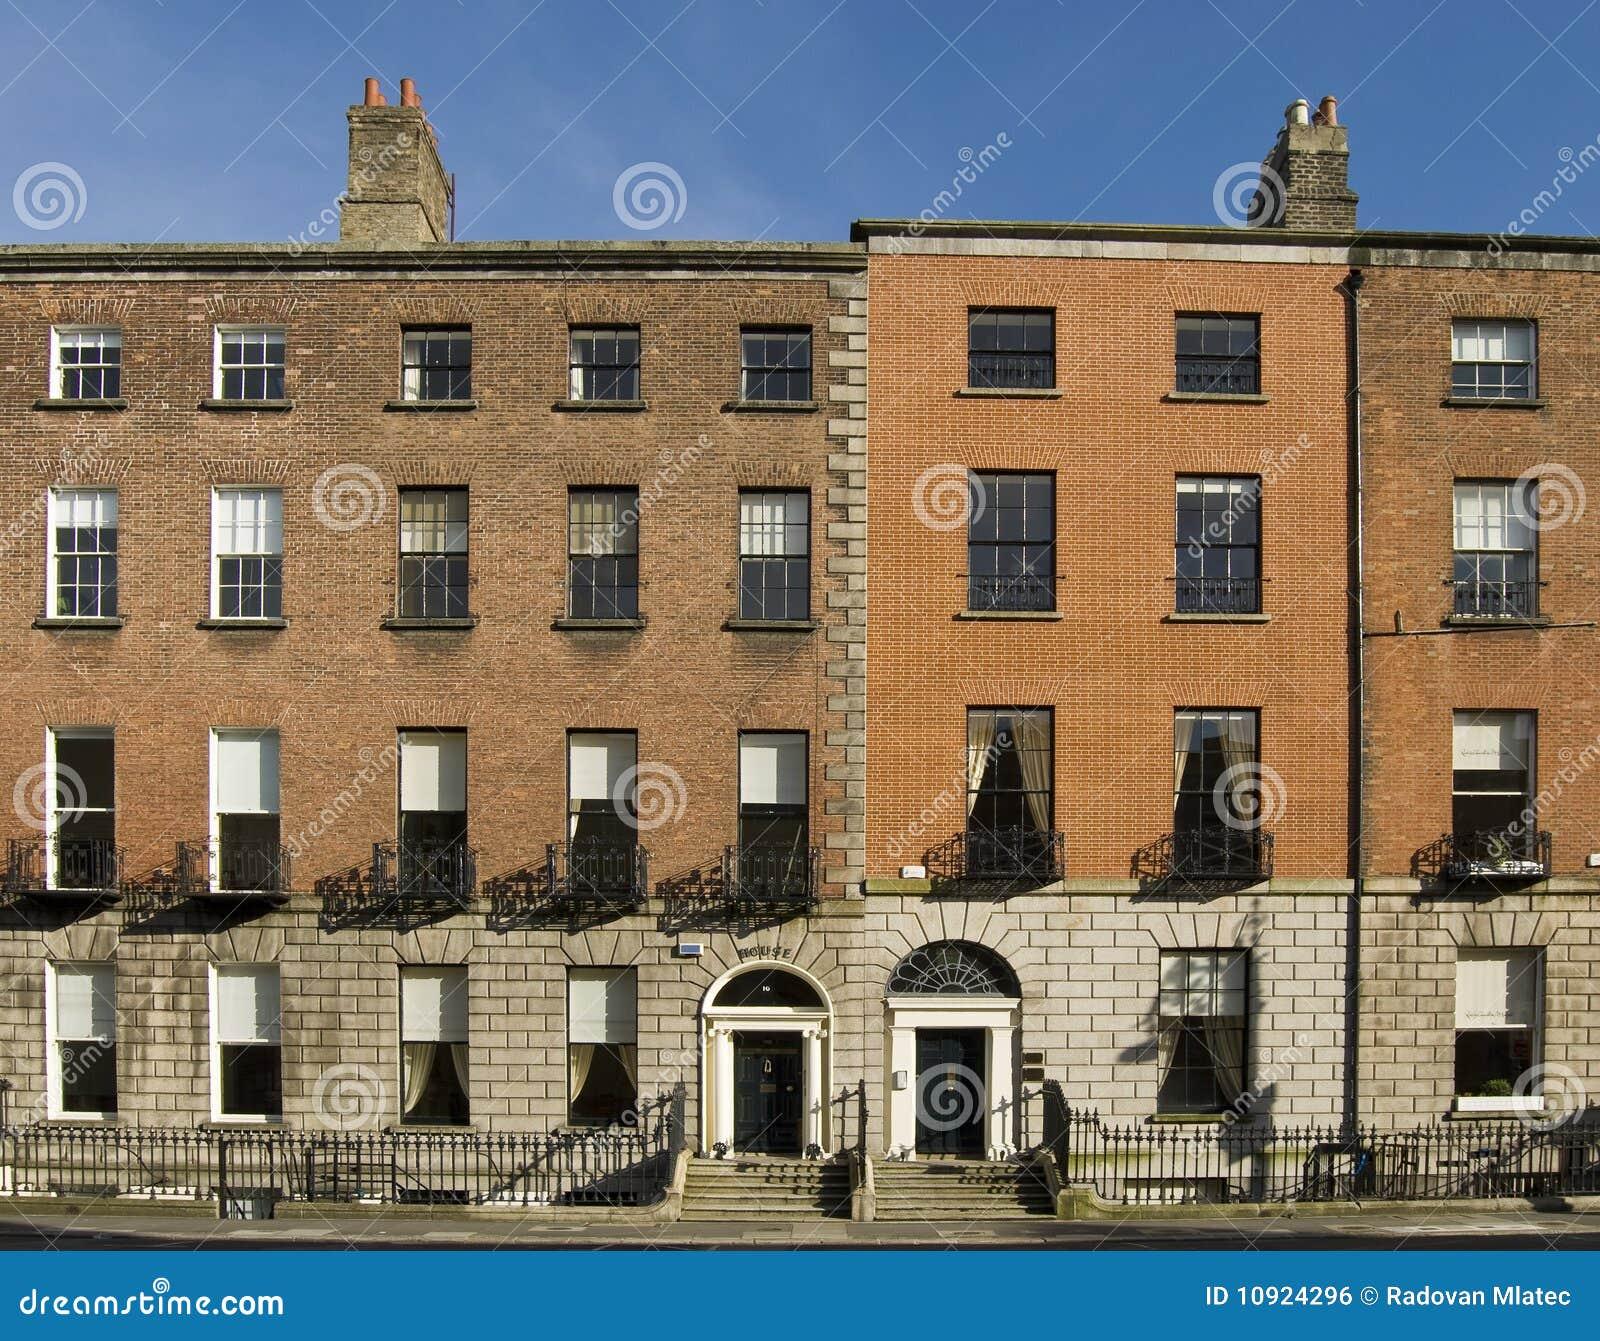 Small Spaces Architects Dublin Ireland Houses: Dublin Georgian Houses Royalty Free Stock Image